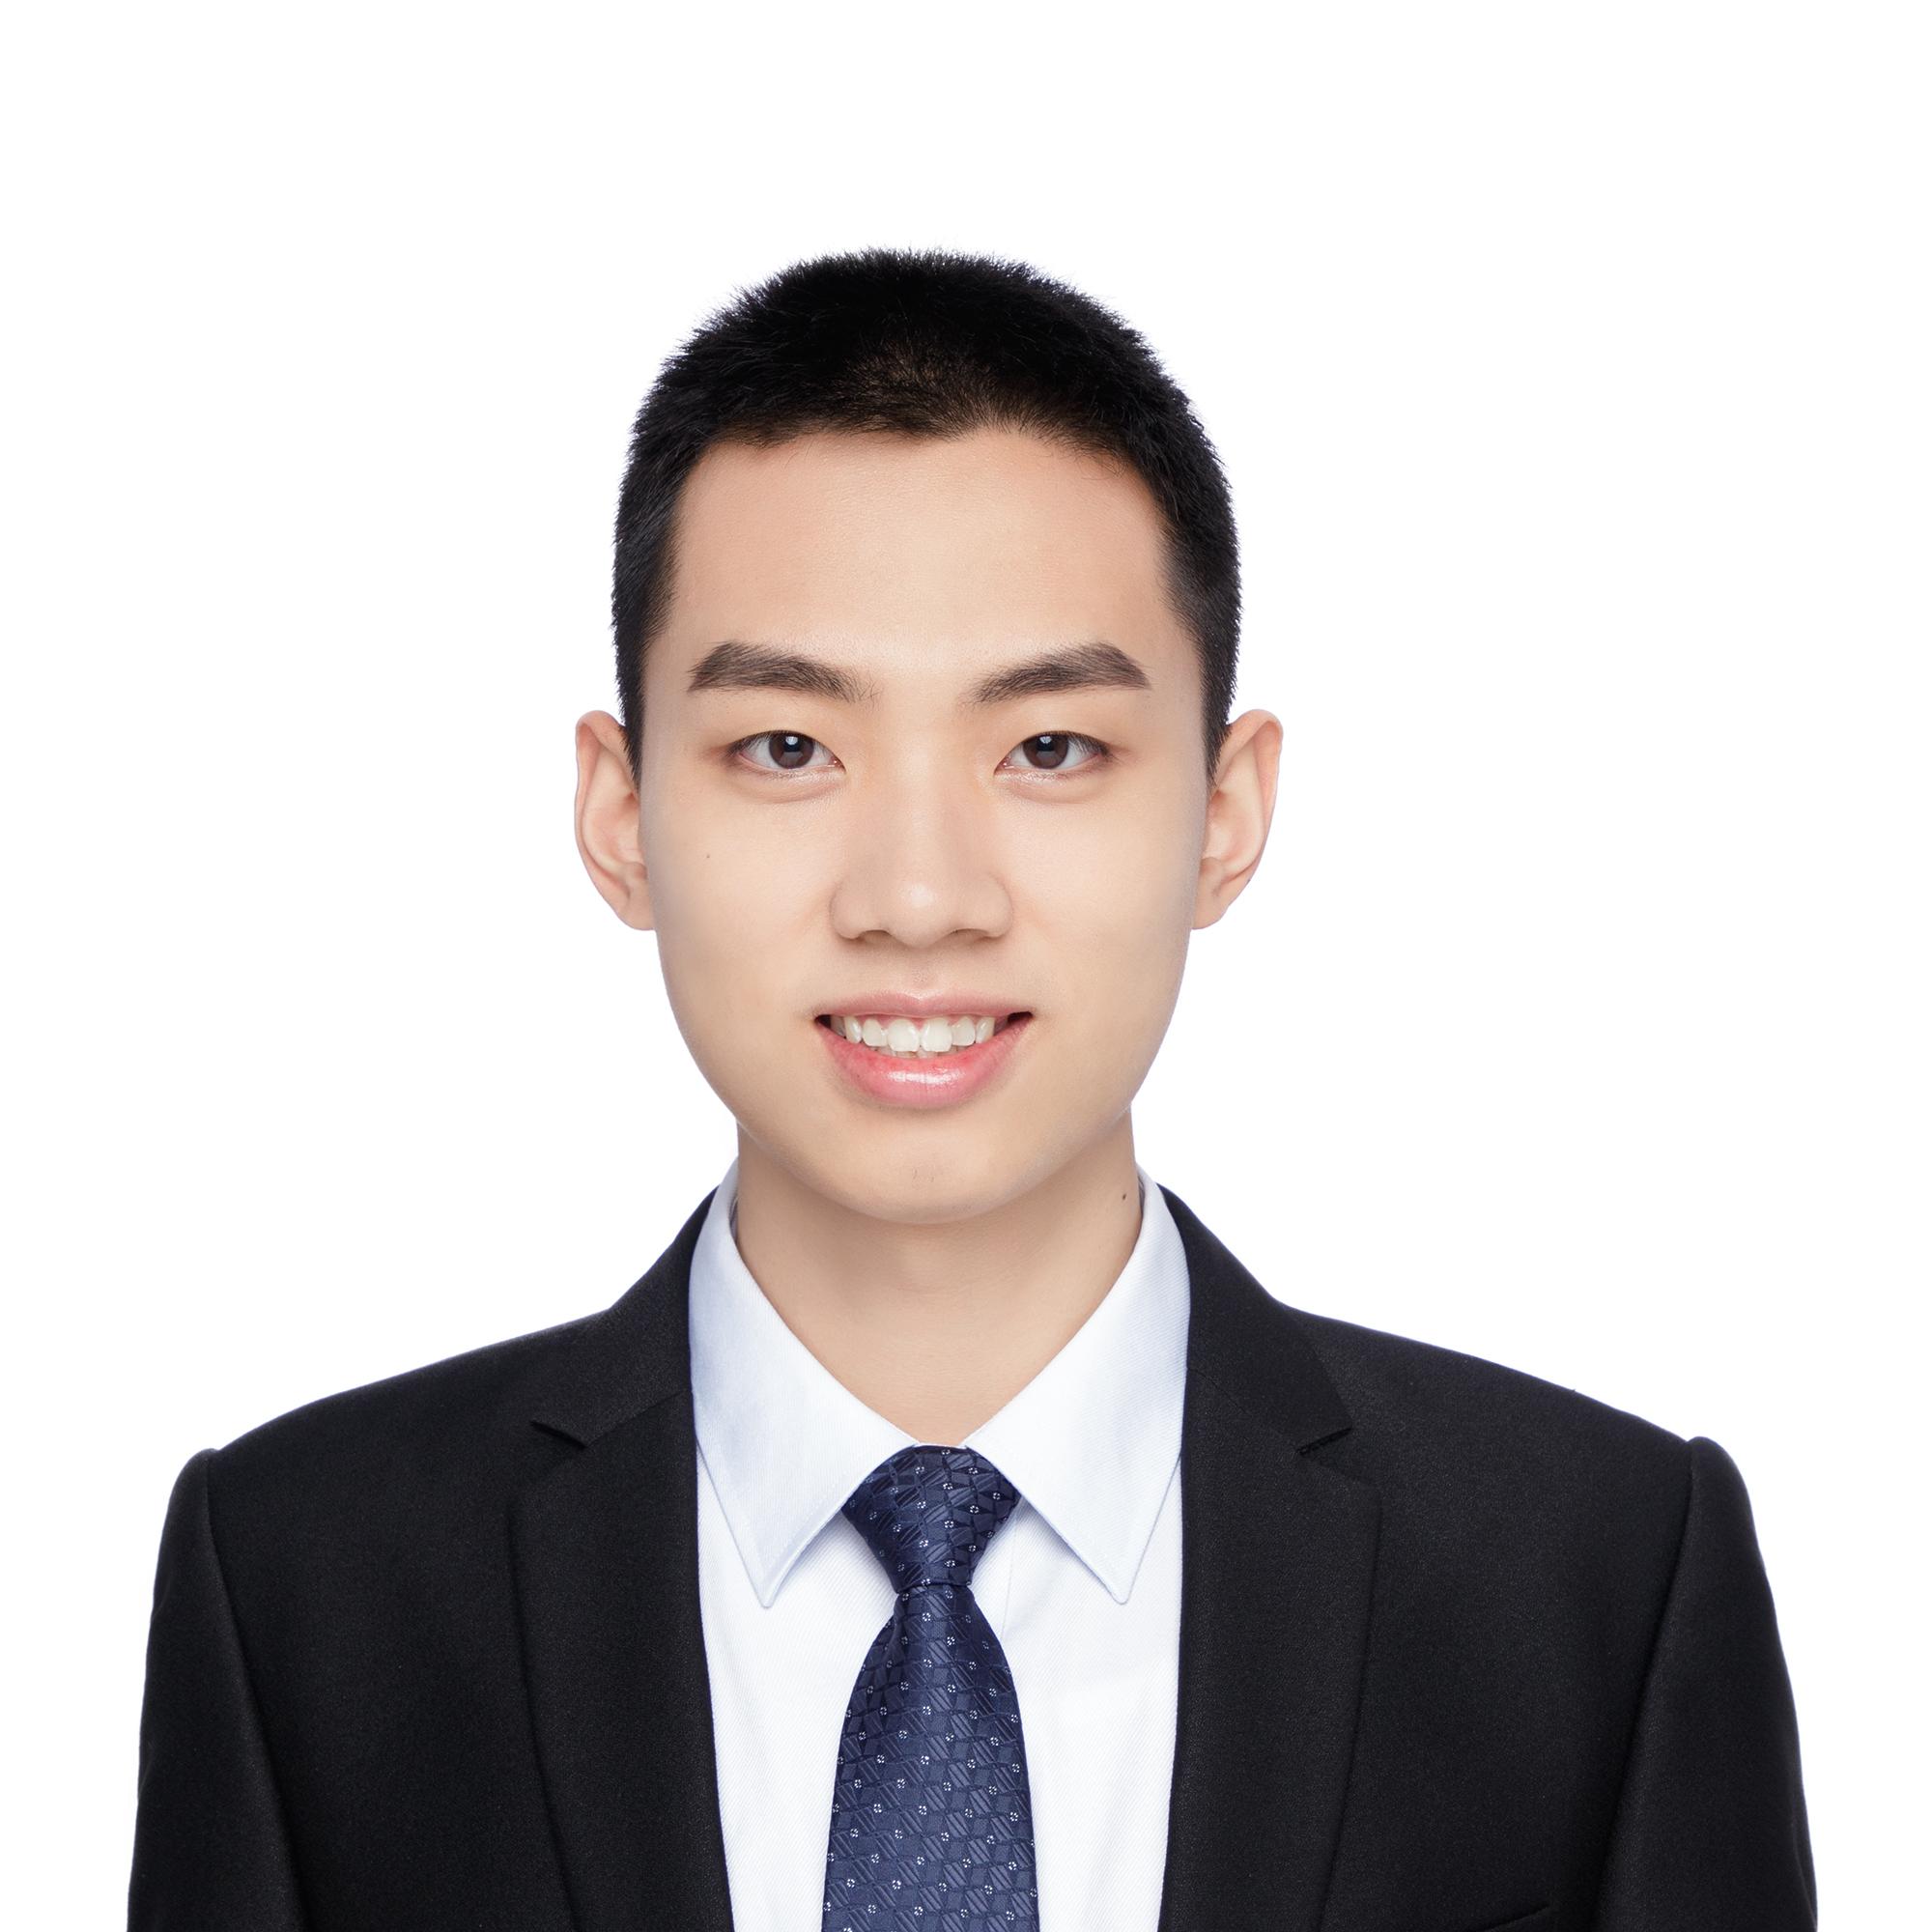 Junze Tan